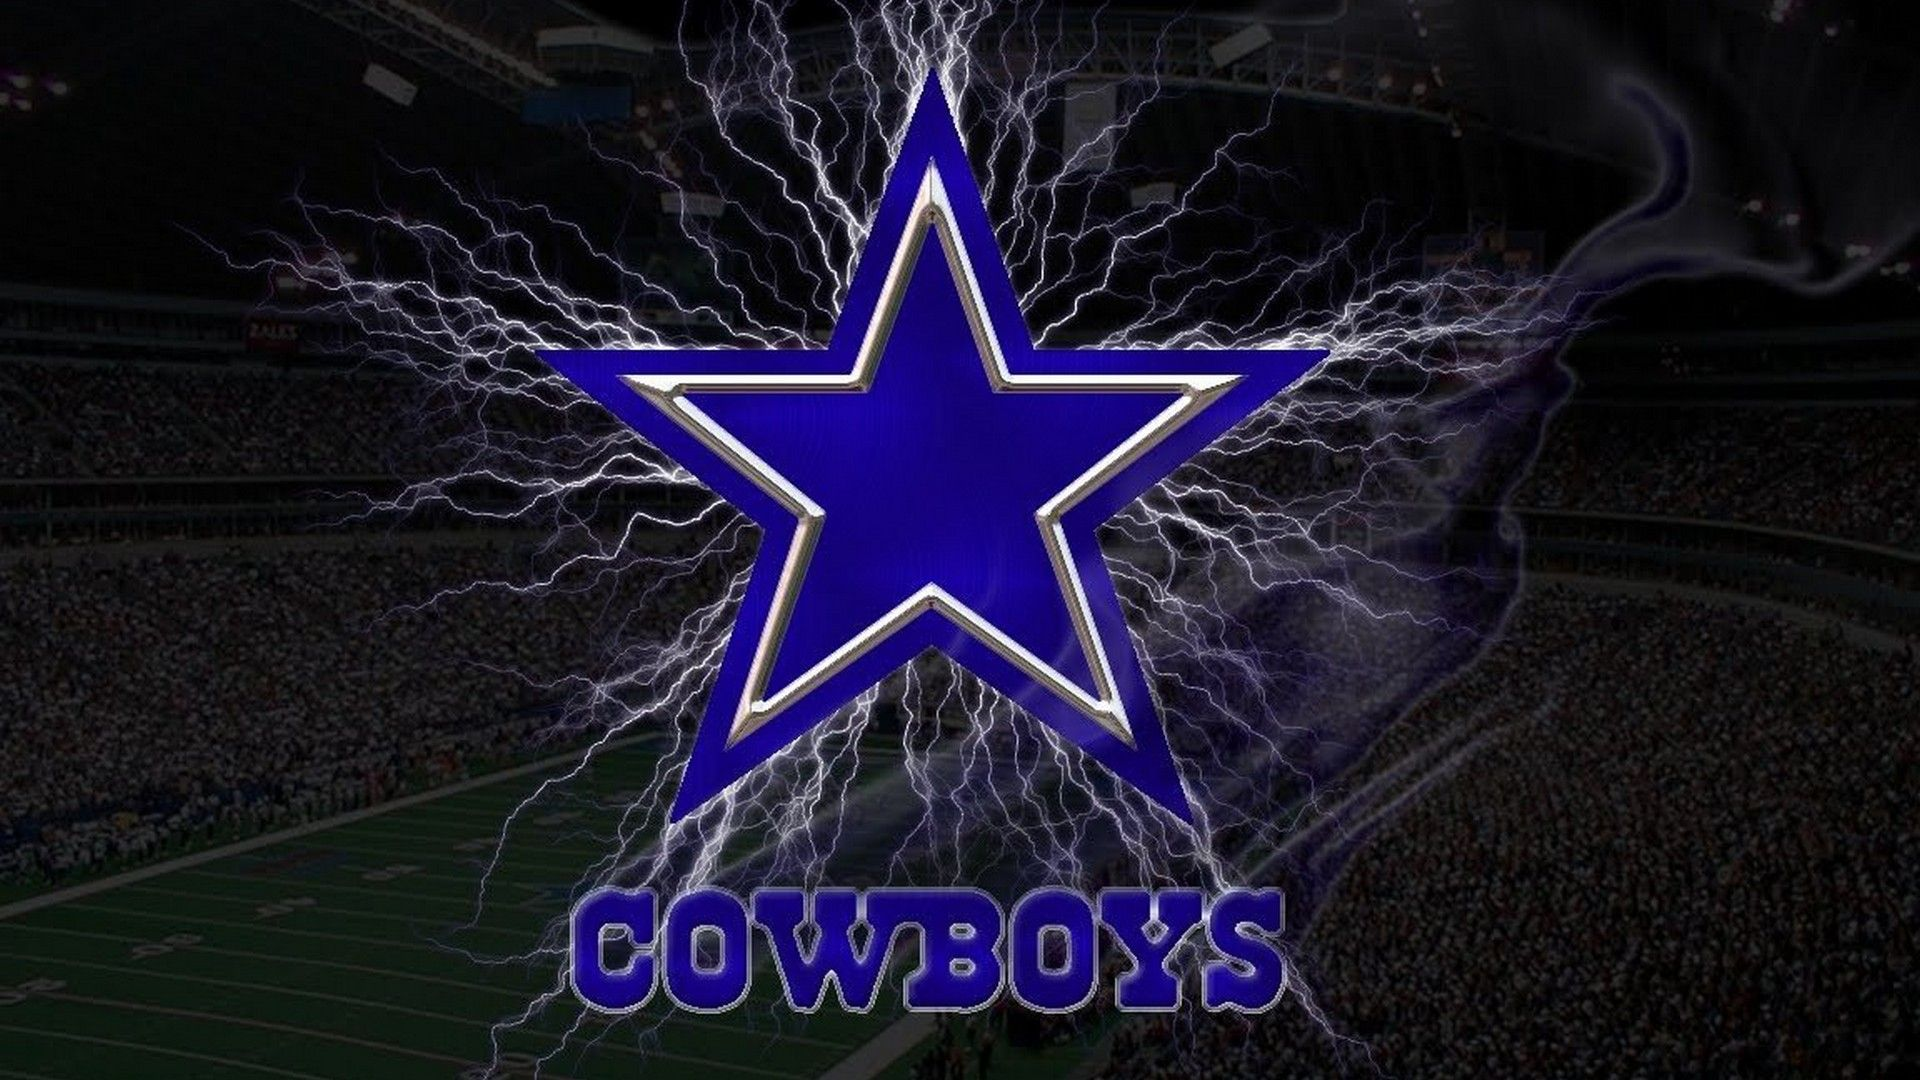 Hd Dallas Cowboys Wallpapers 2020 Nfl Football Wallpapers Dallas Cowboys Wallpaper Football Wallpaper Nfl Football Wallpaper